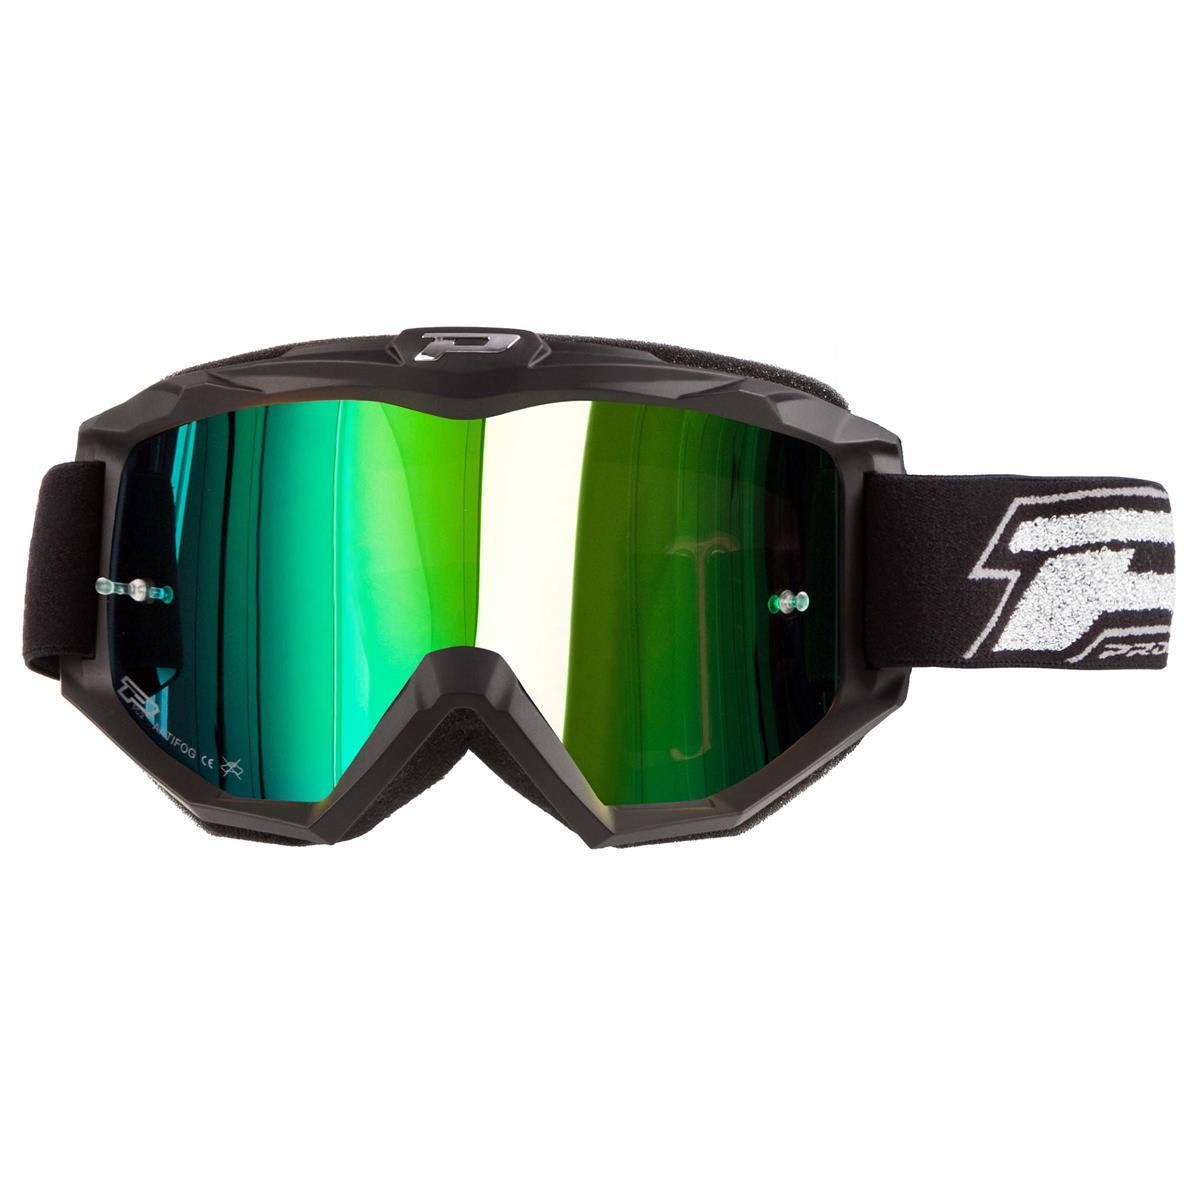 ProGrip Crossbrille 3204 FL Shiny Grün Mirrored